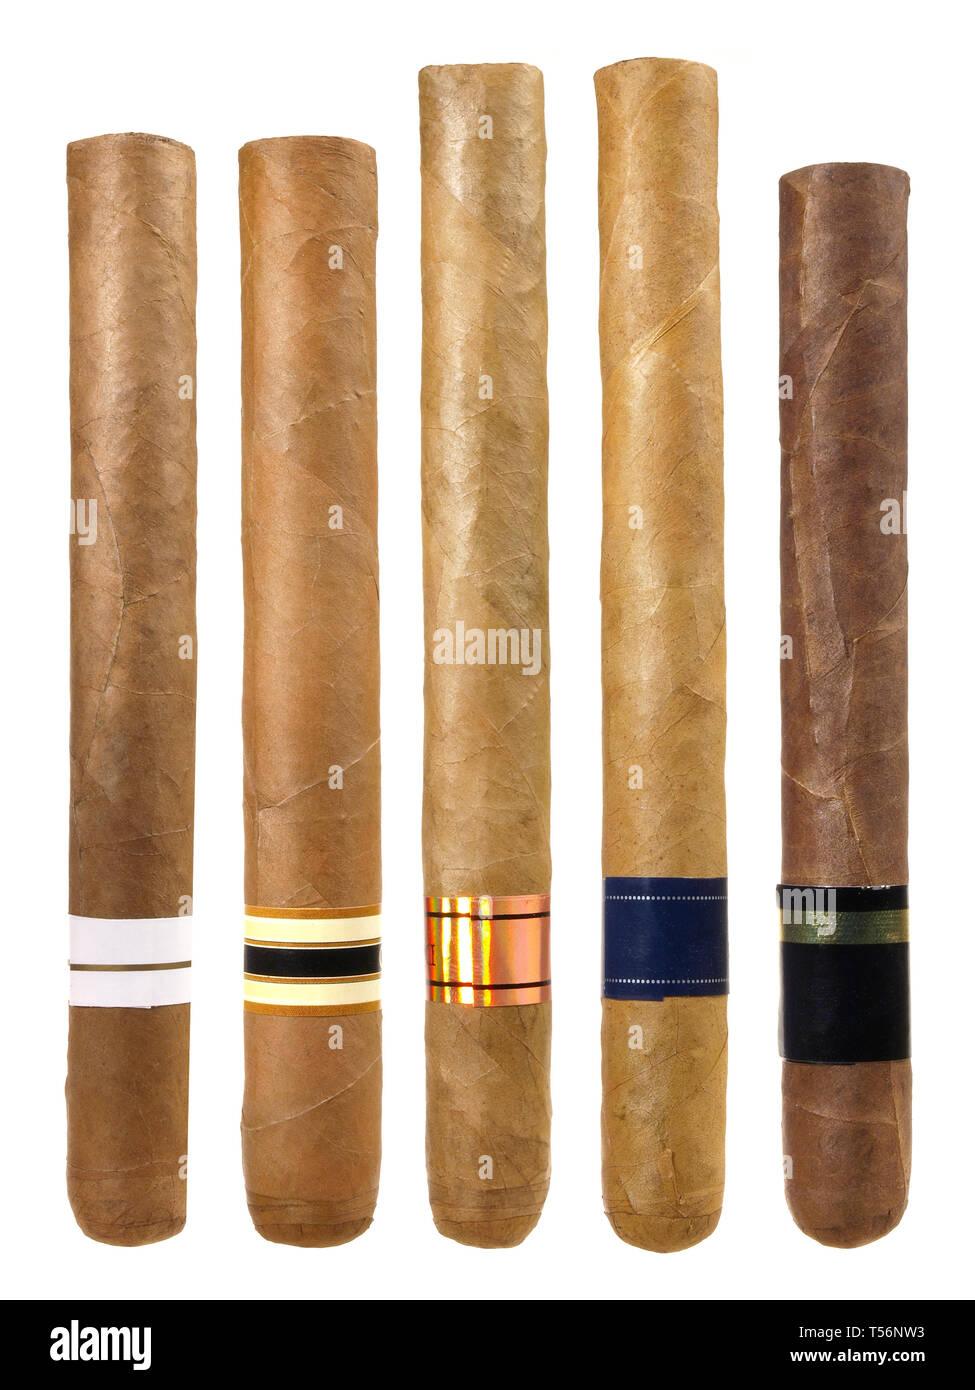 Various Cigars on white Background - Stock Image